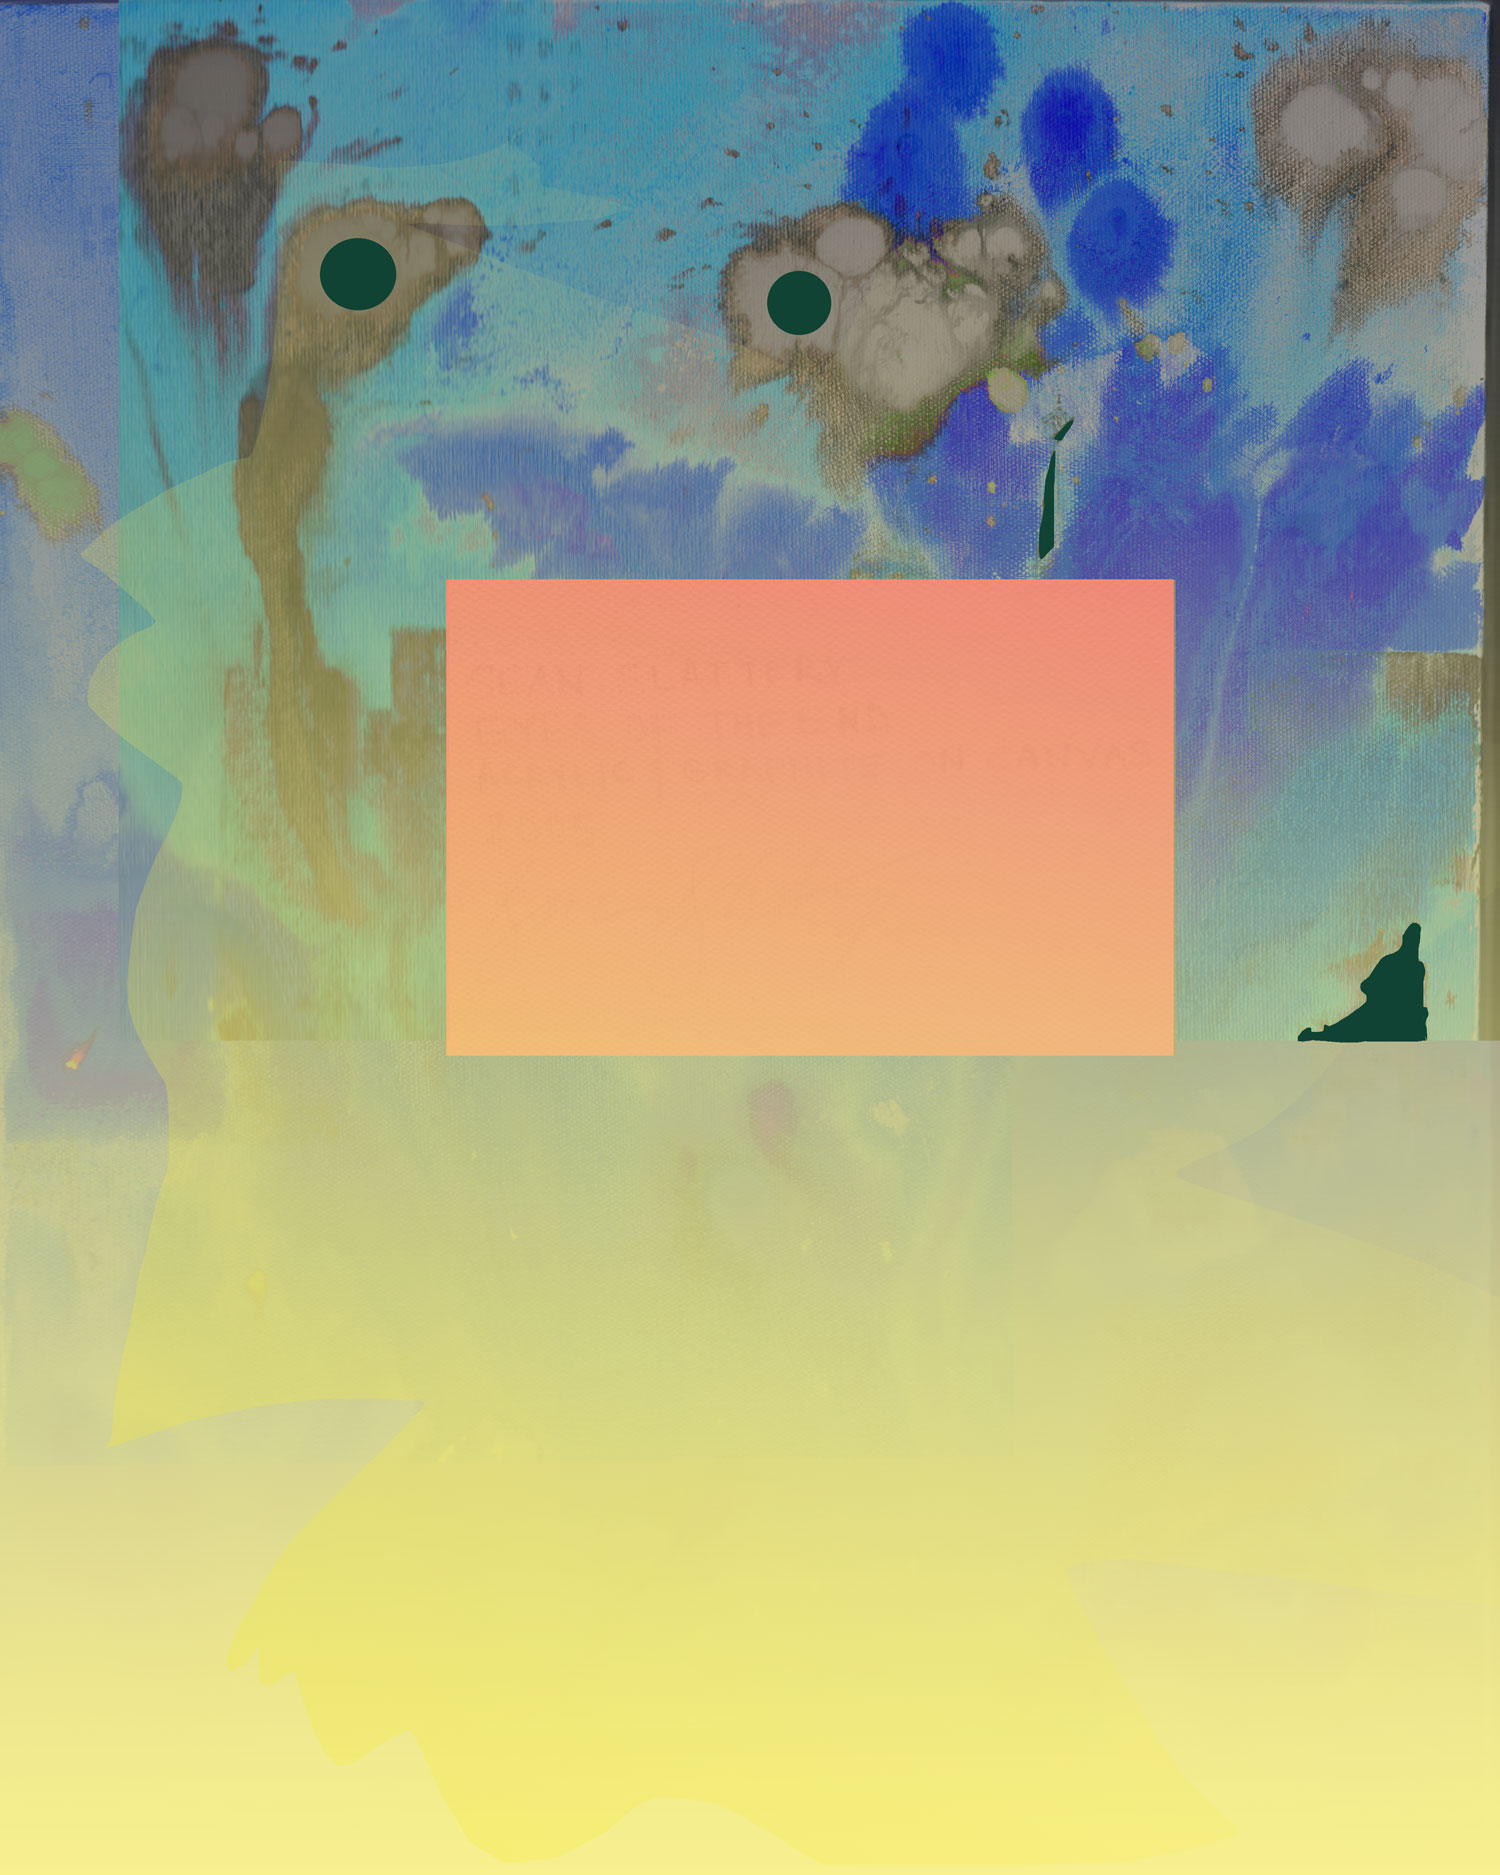 Eyes of the End (Flesh Rec)